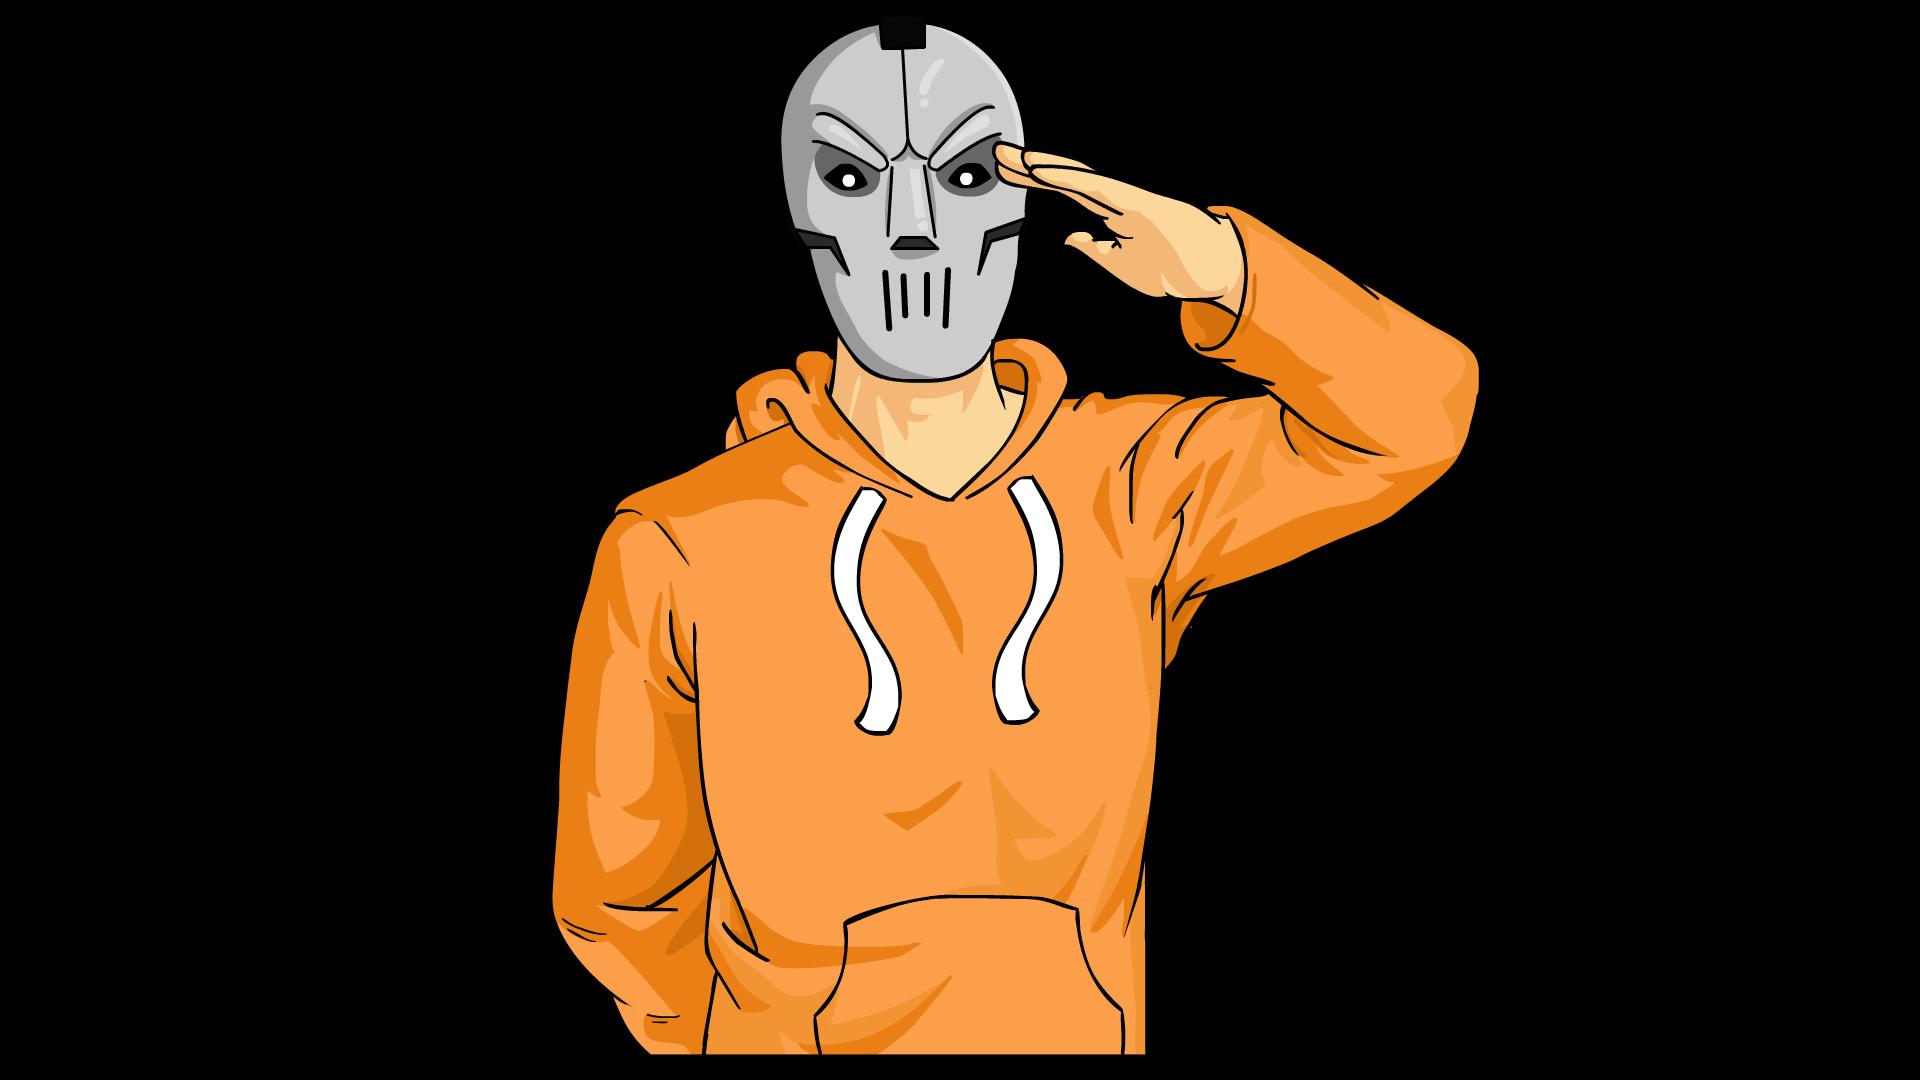 GTA character